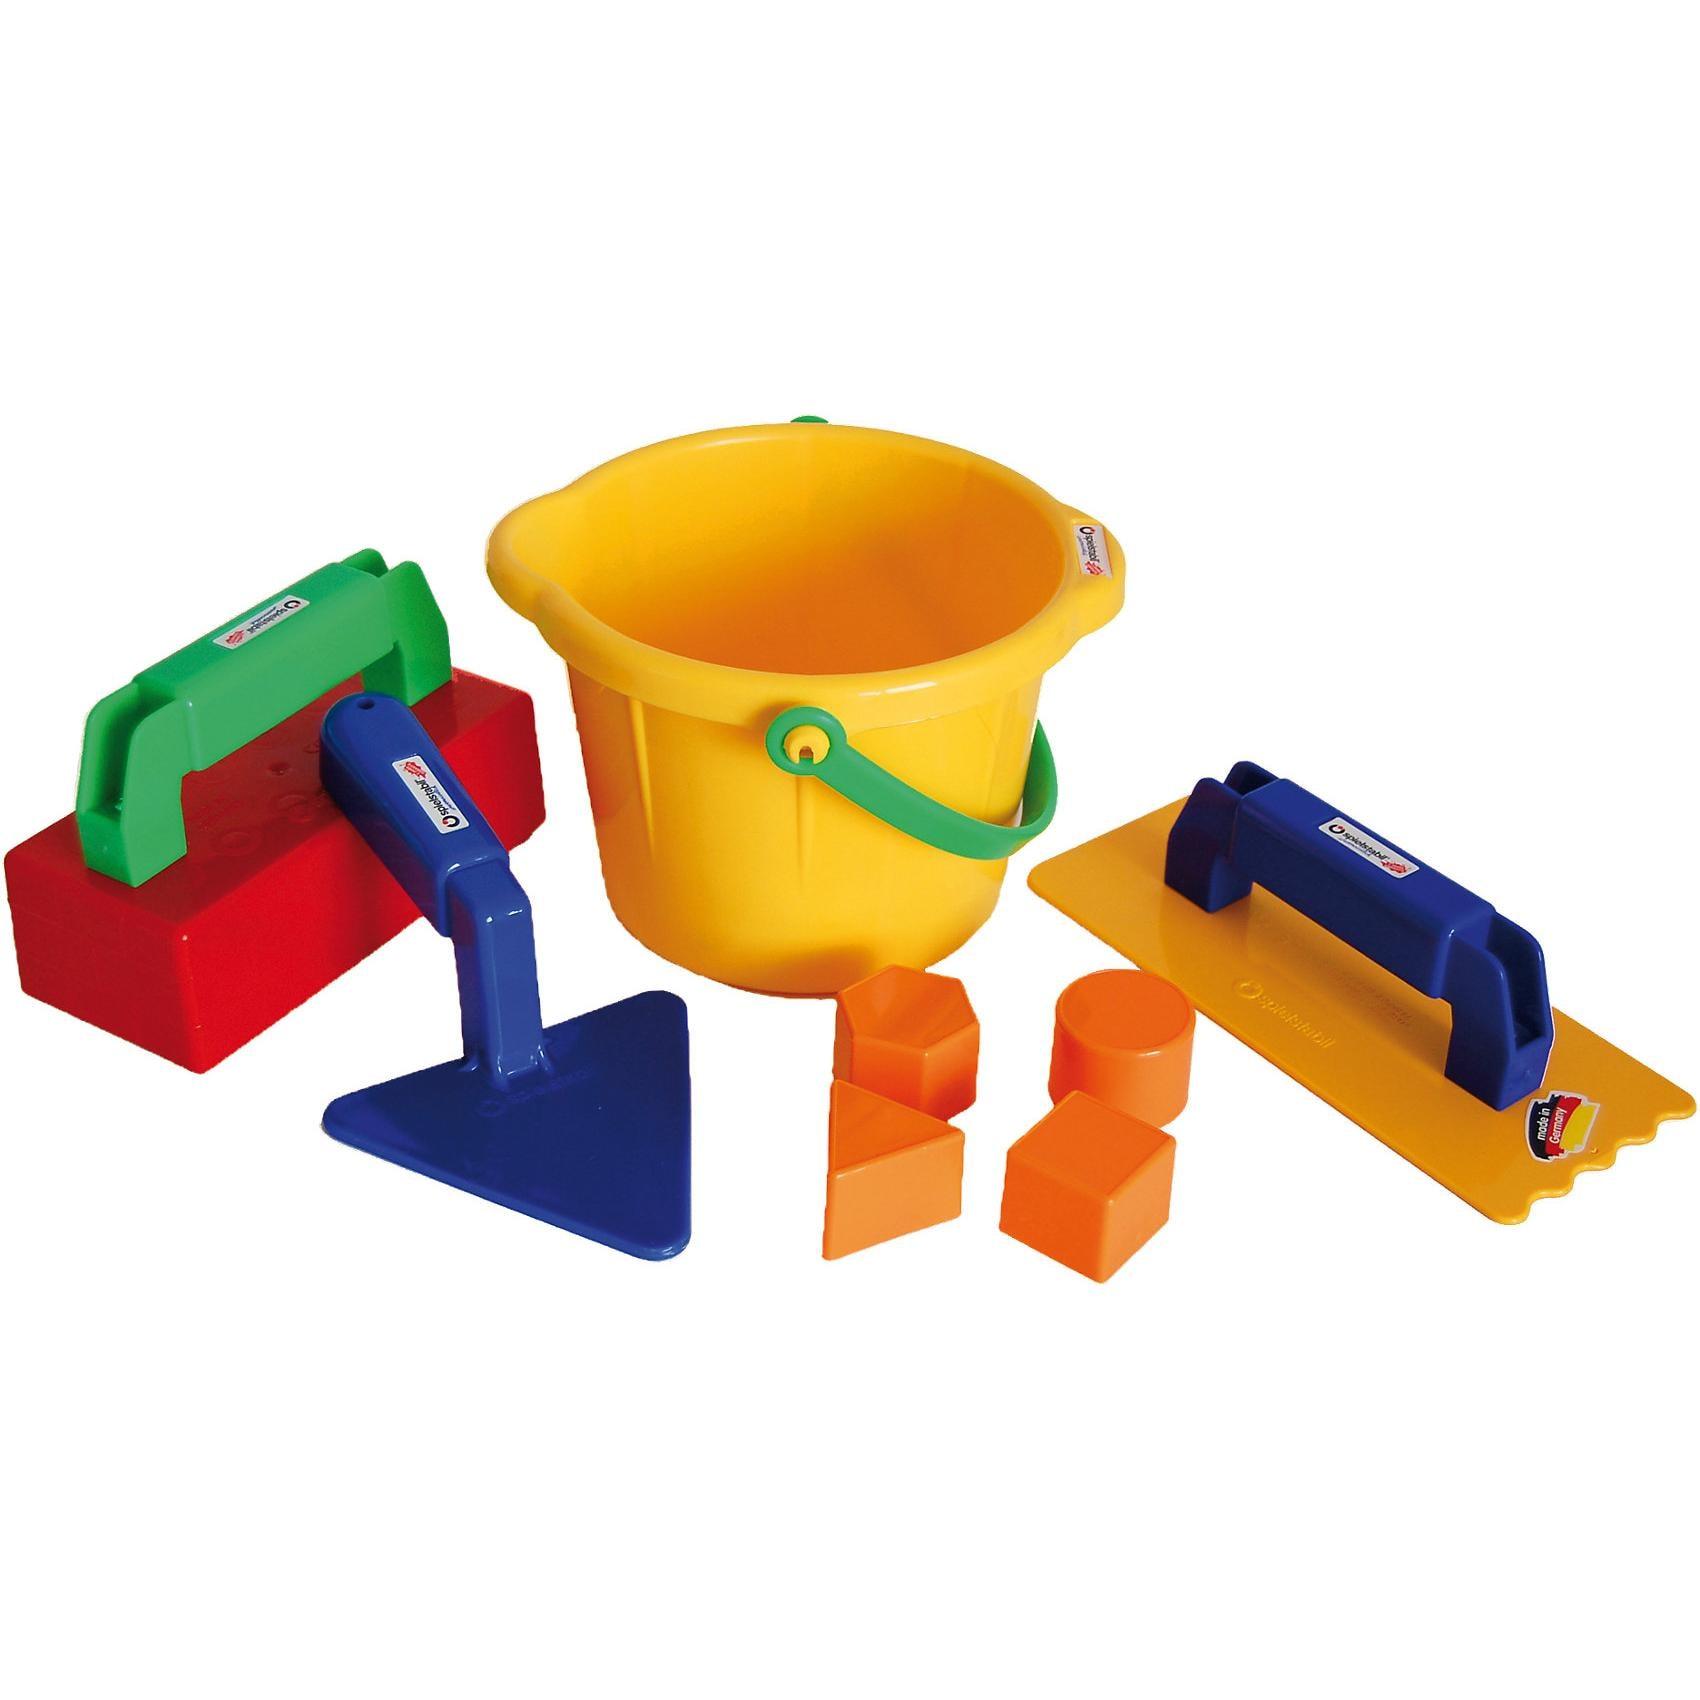 Spielstabil Baumeisterset 8-teilig